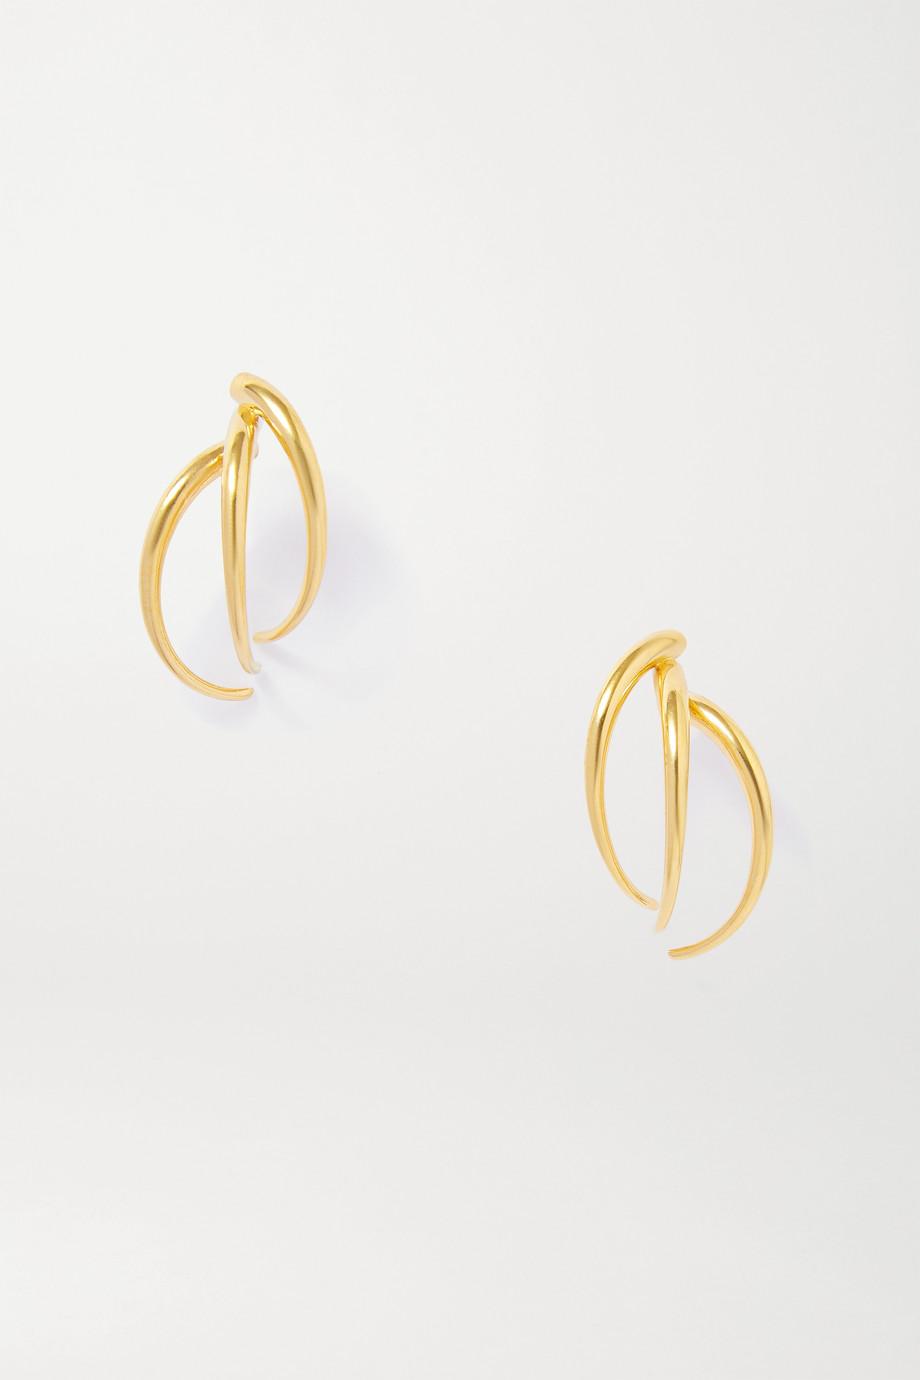 SARAH & SEBASTIAN Stinger Ohrringe aus Gold-Vermeil